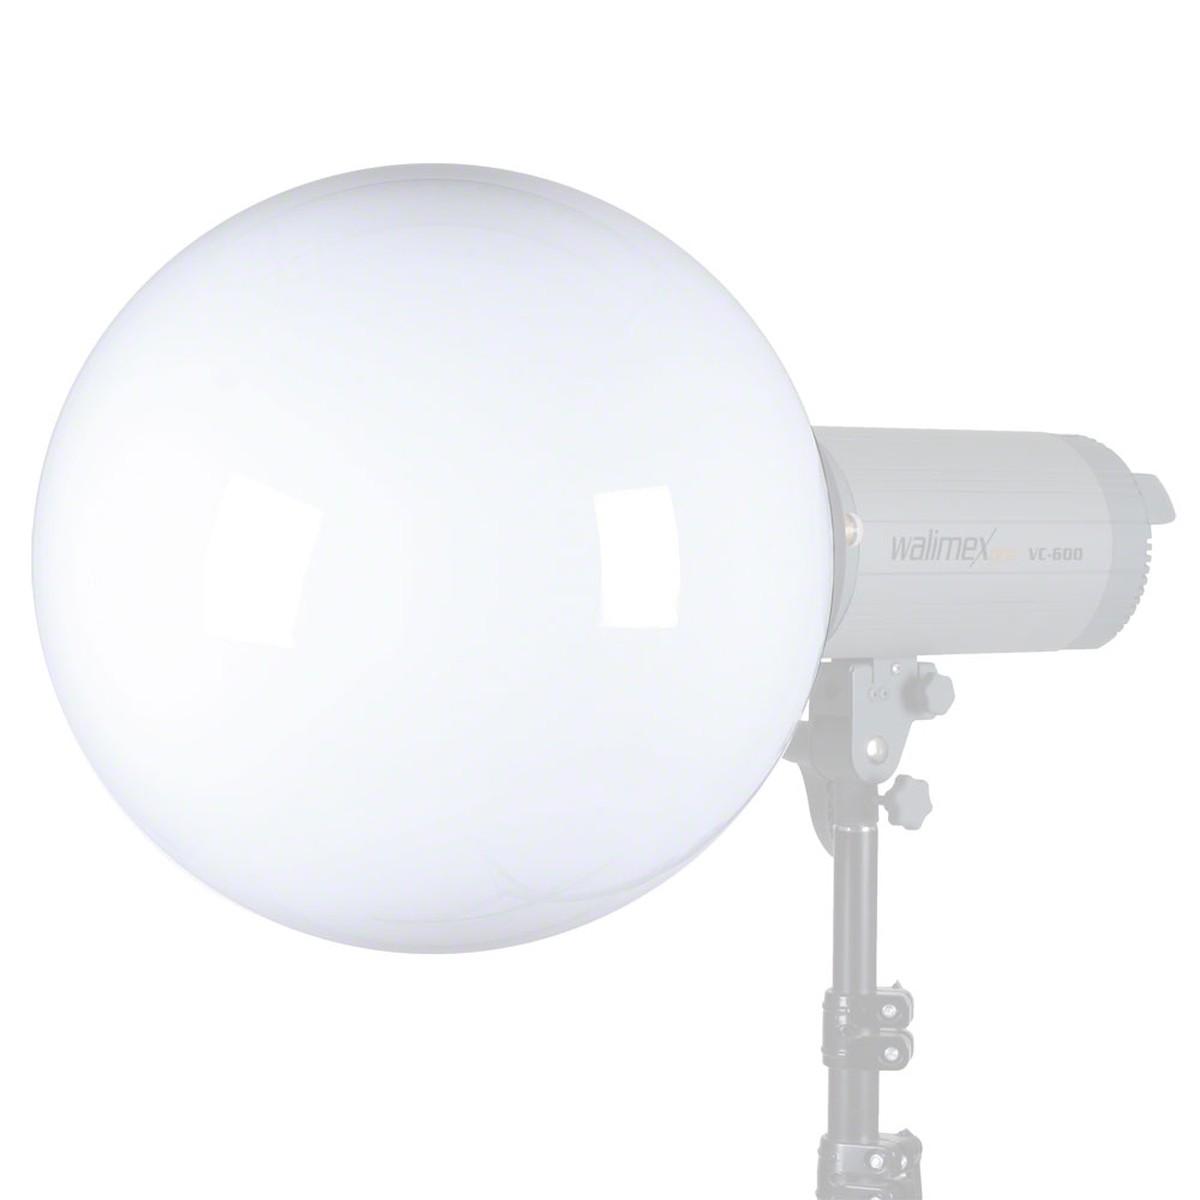 Walimex Univ. Spherical Diffuser, 30cm Balcar